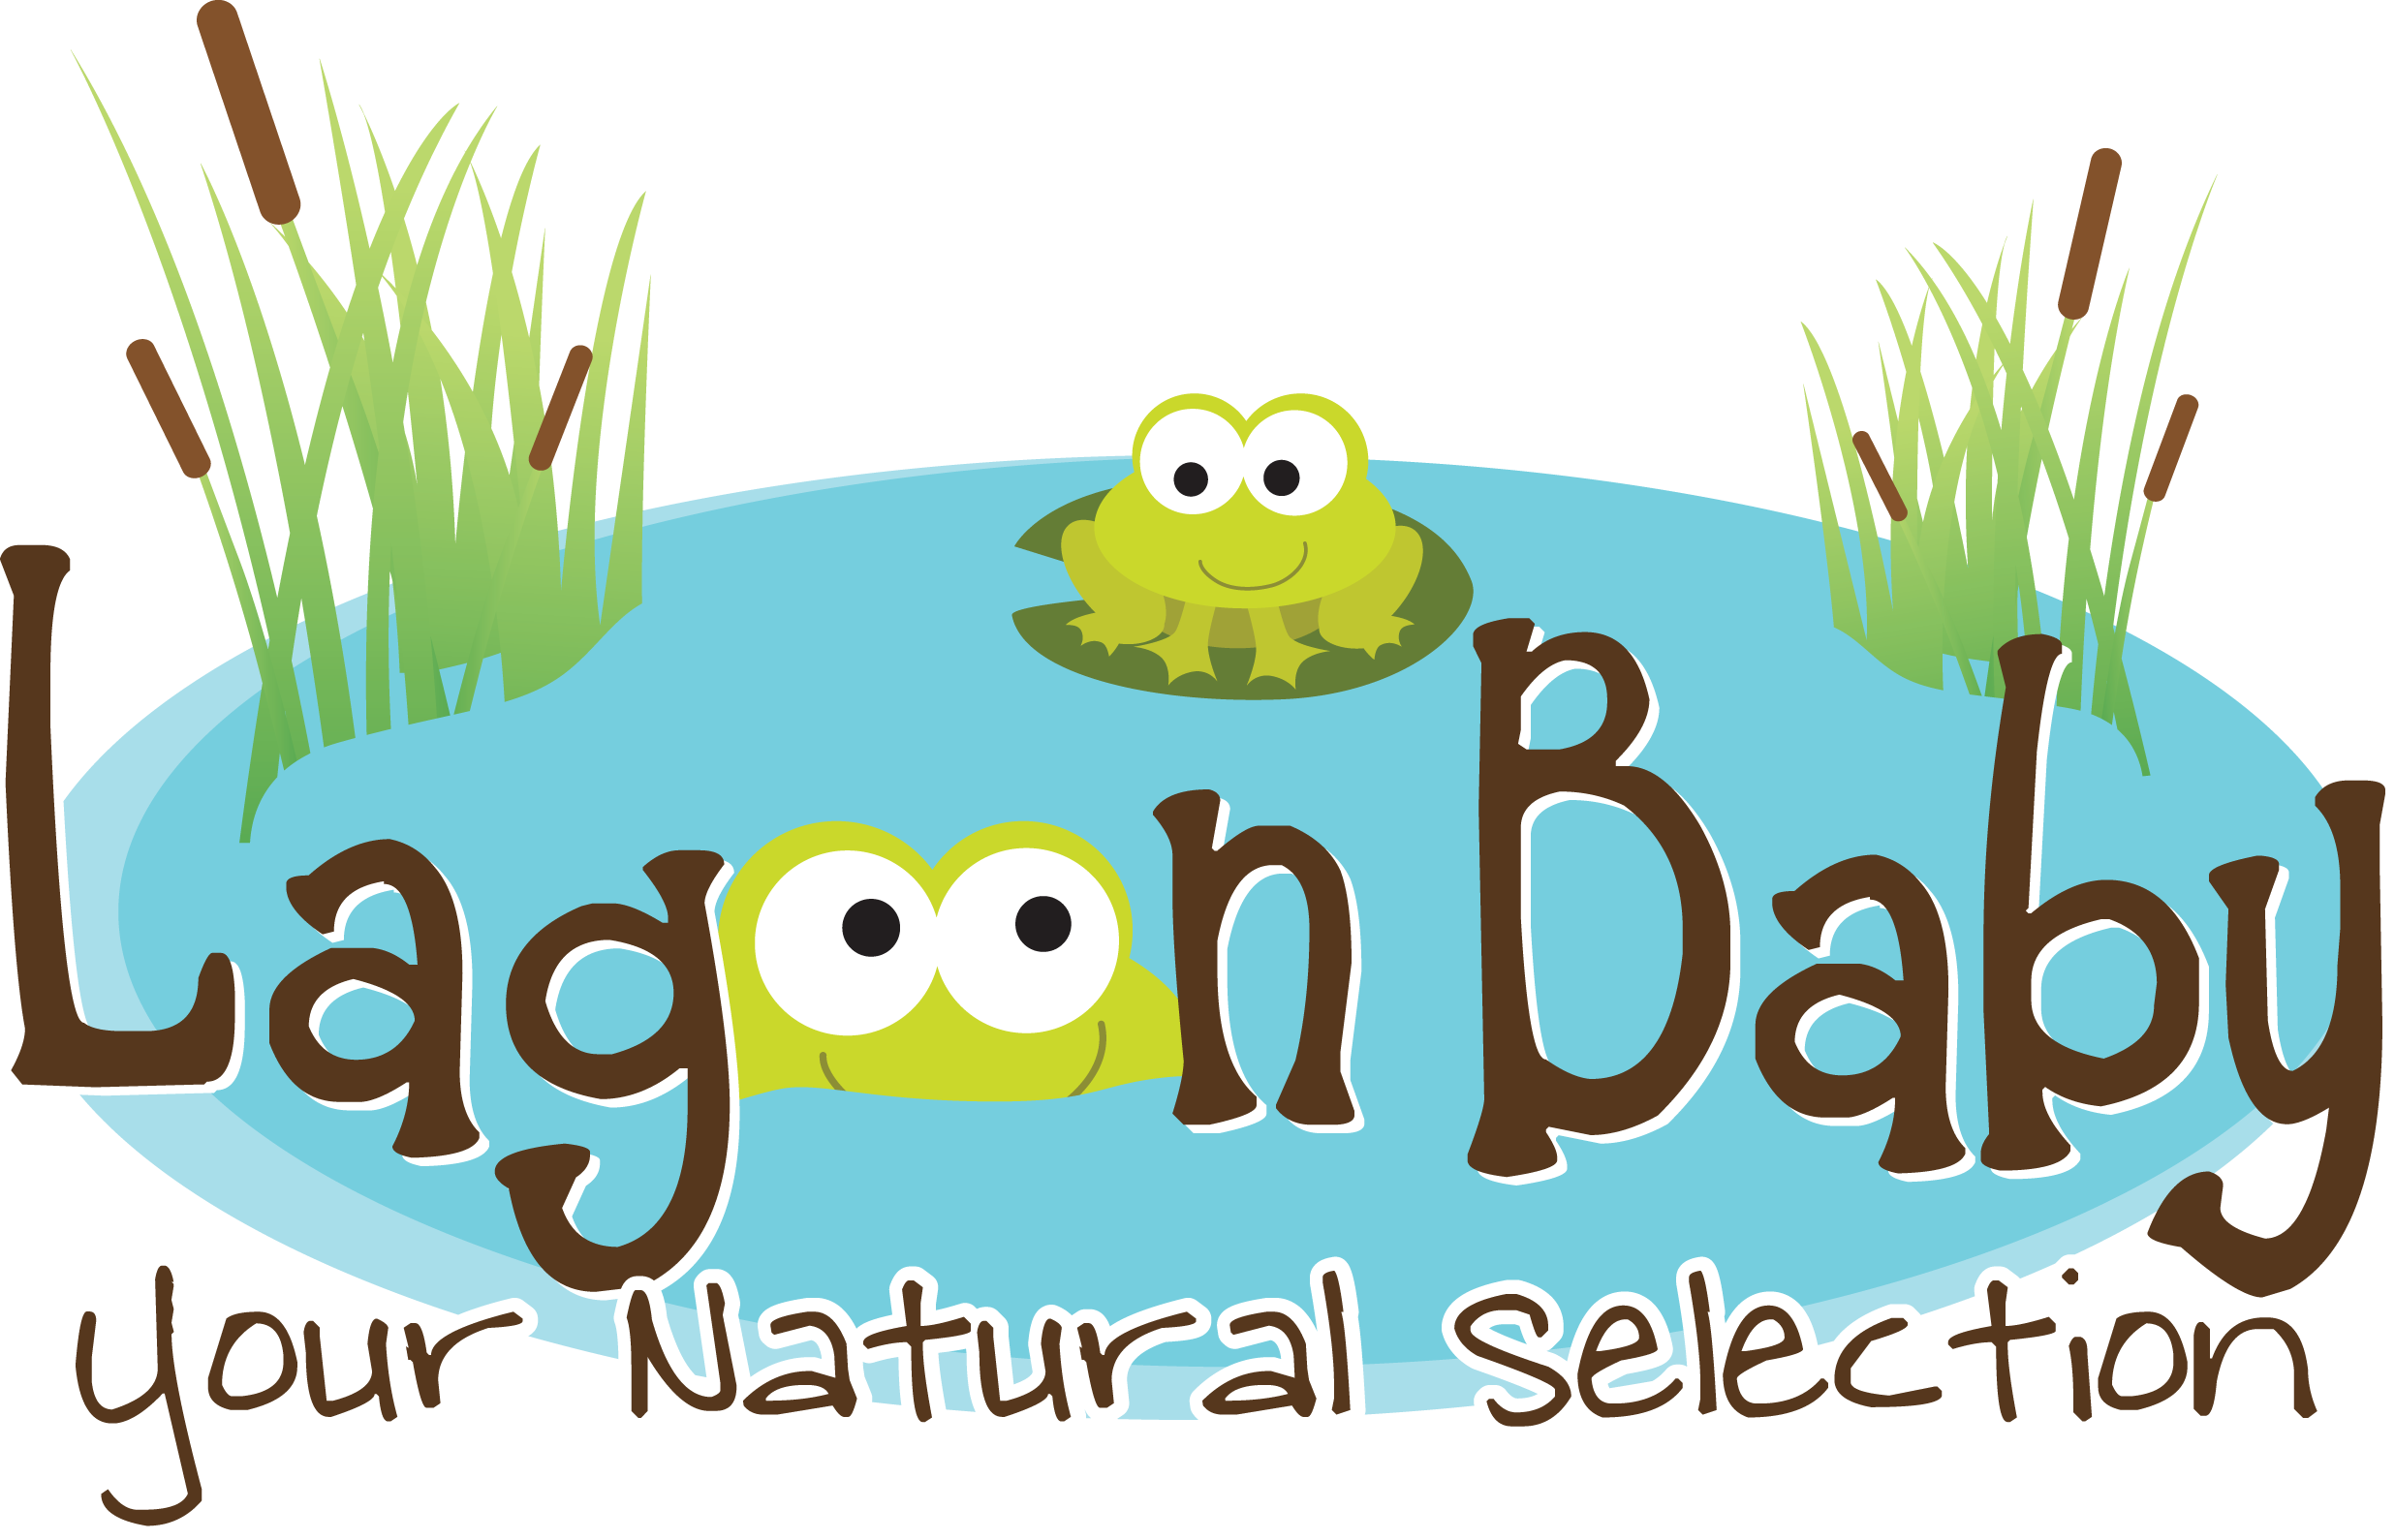 Lagoon Baby Logo 2012